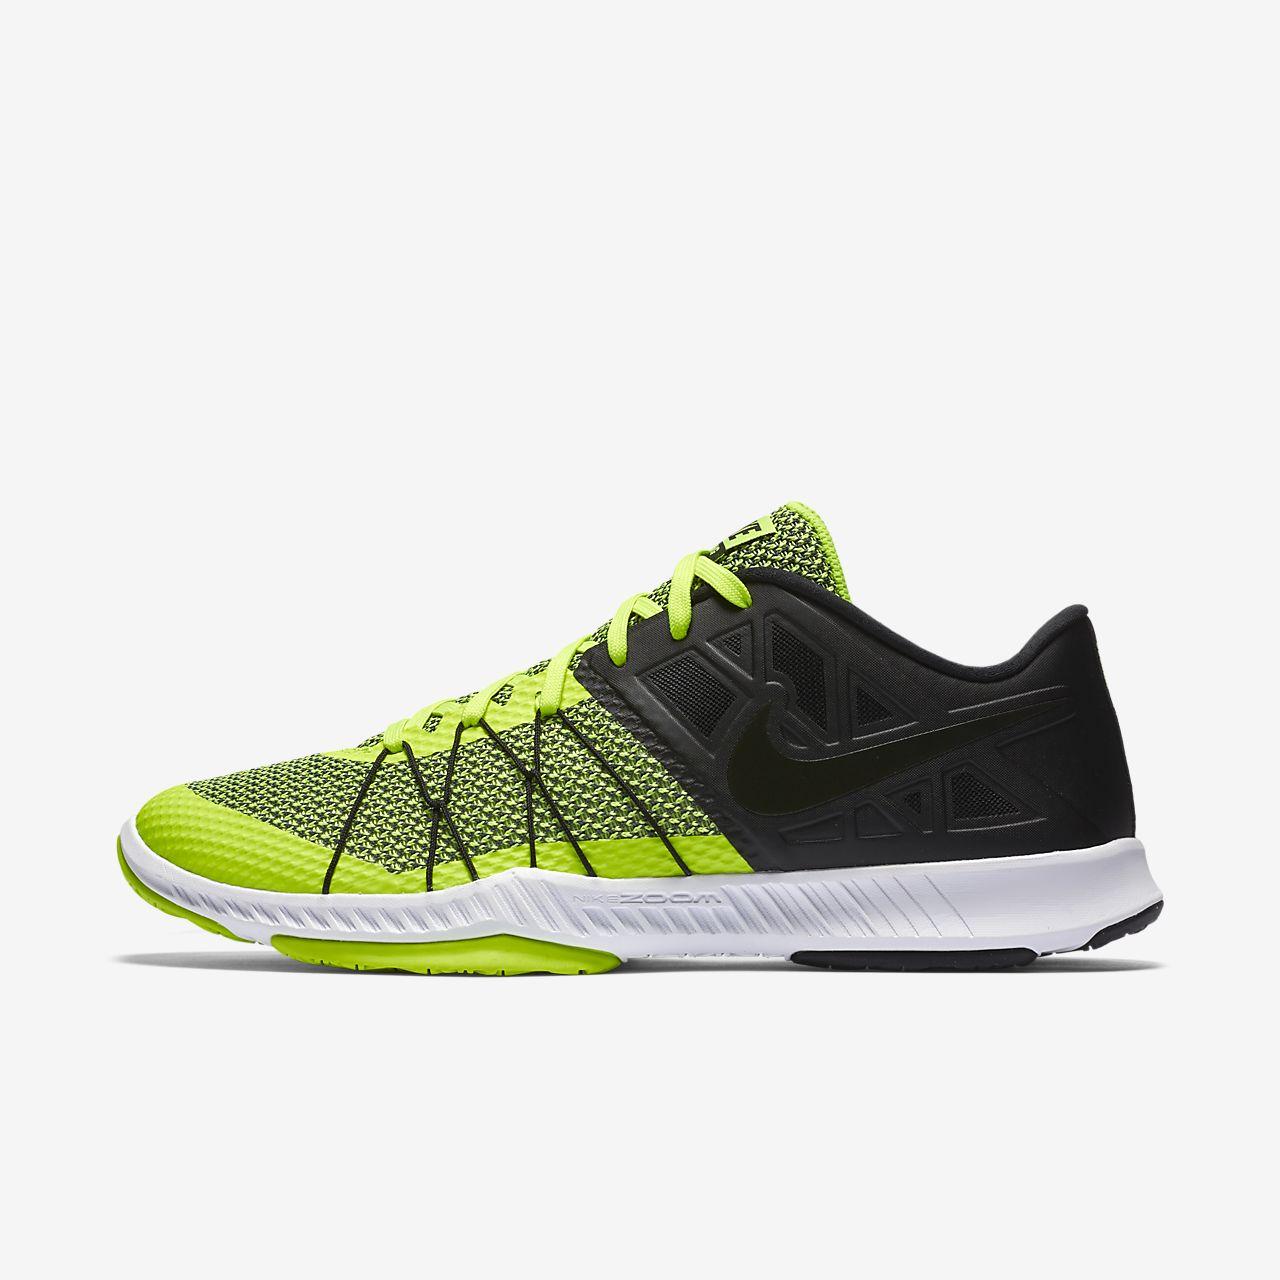 Mens Nike Zoom Train Incredibly Fast Black Green White Black Sneakers Z60498